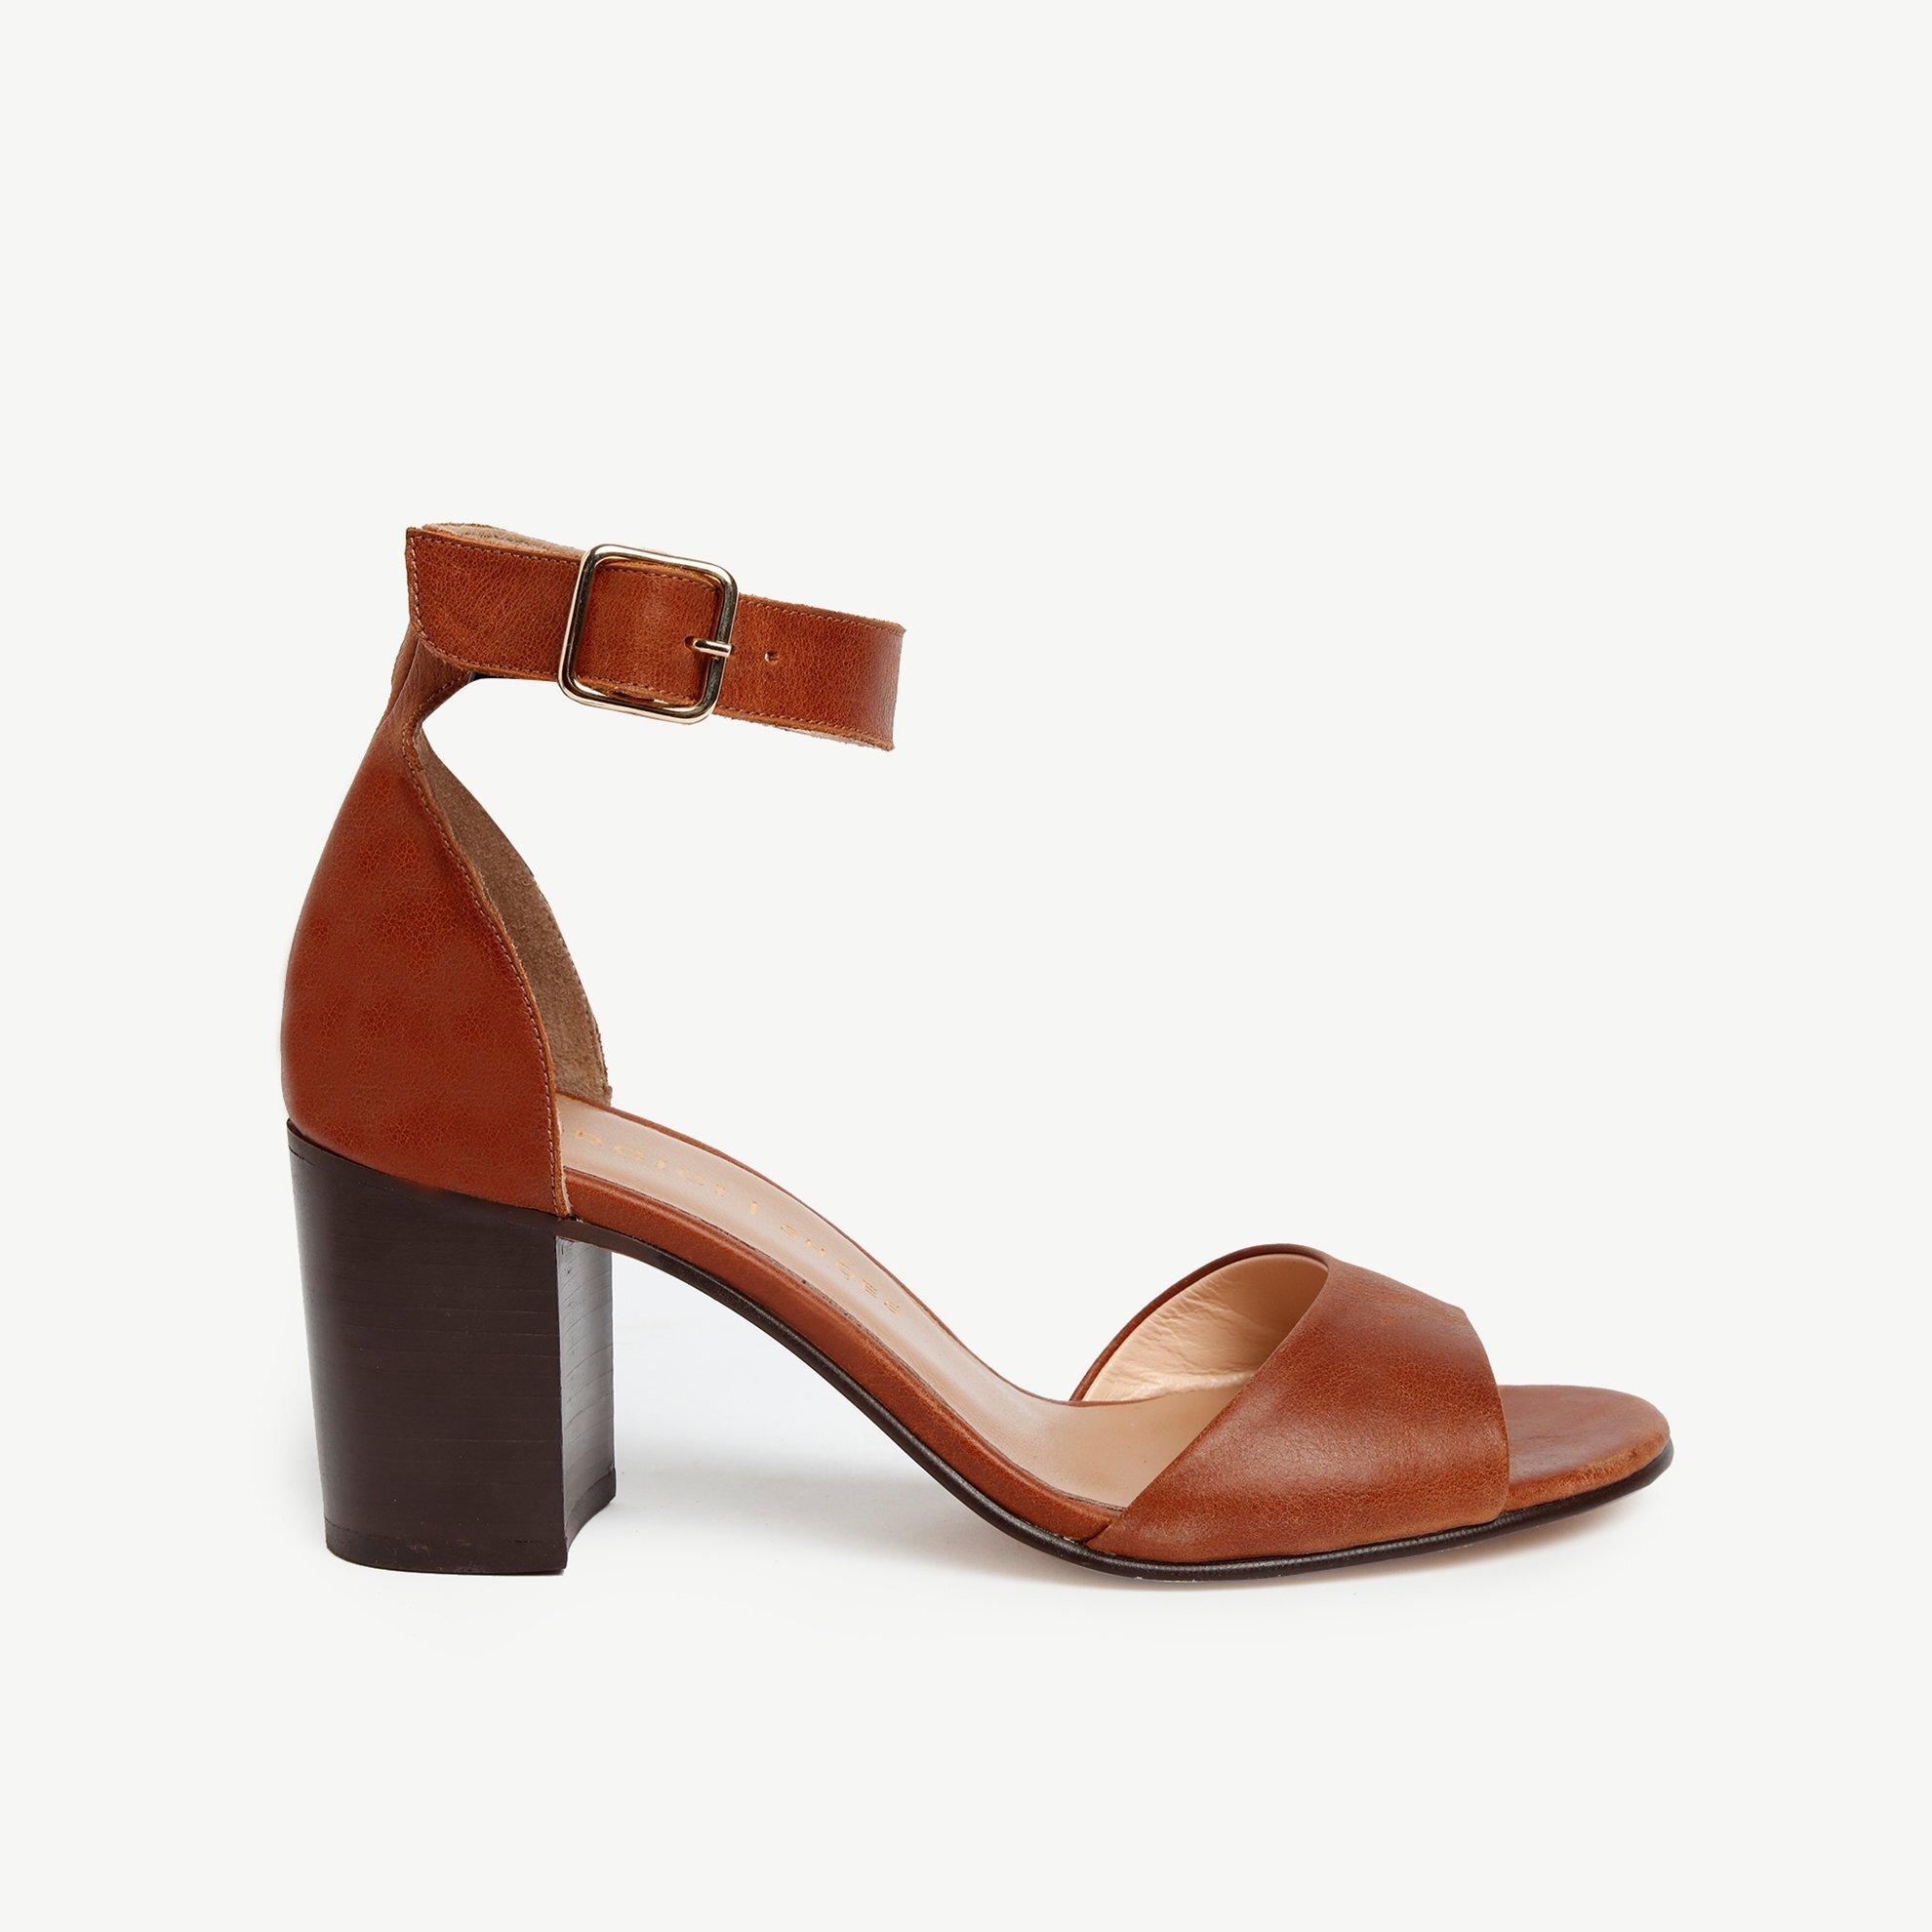 Leather HigH-Heel Sandal